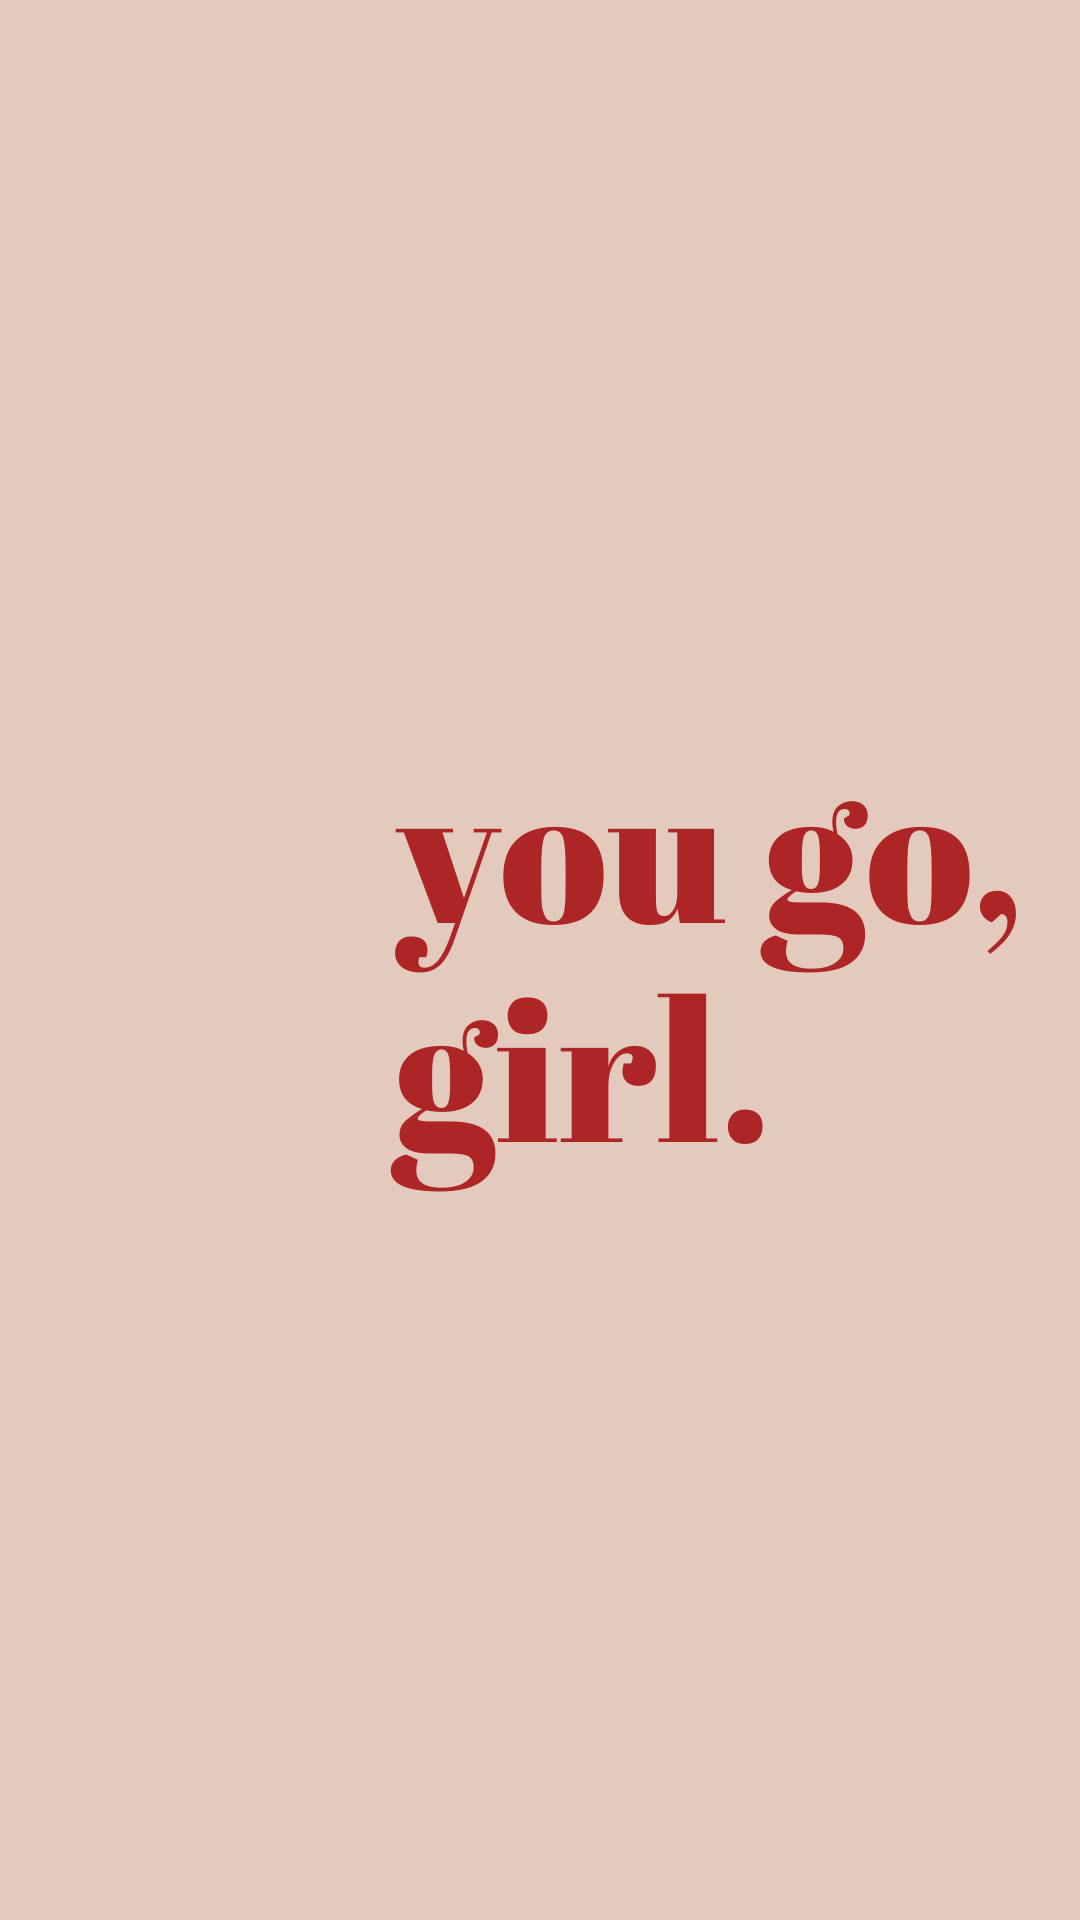 YOU GO GIRL - minimal phone wallpaper